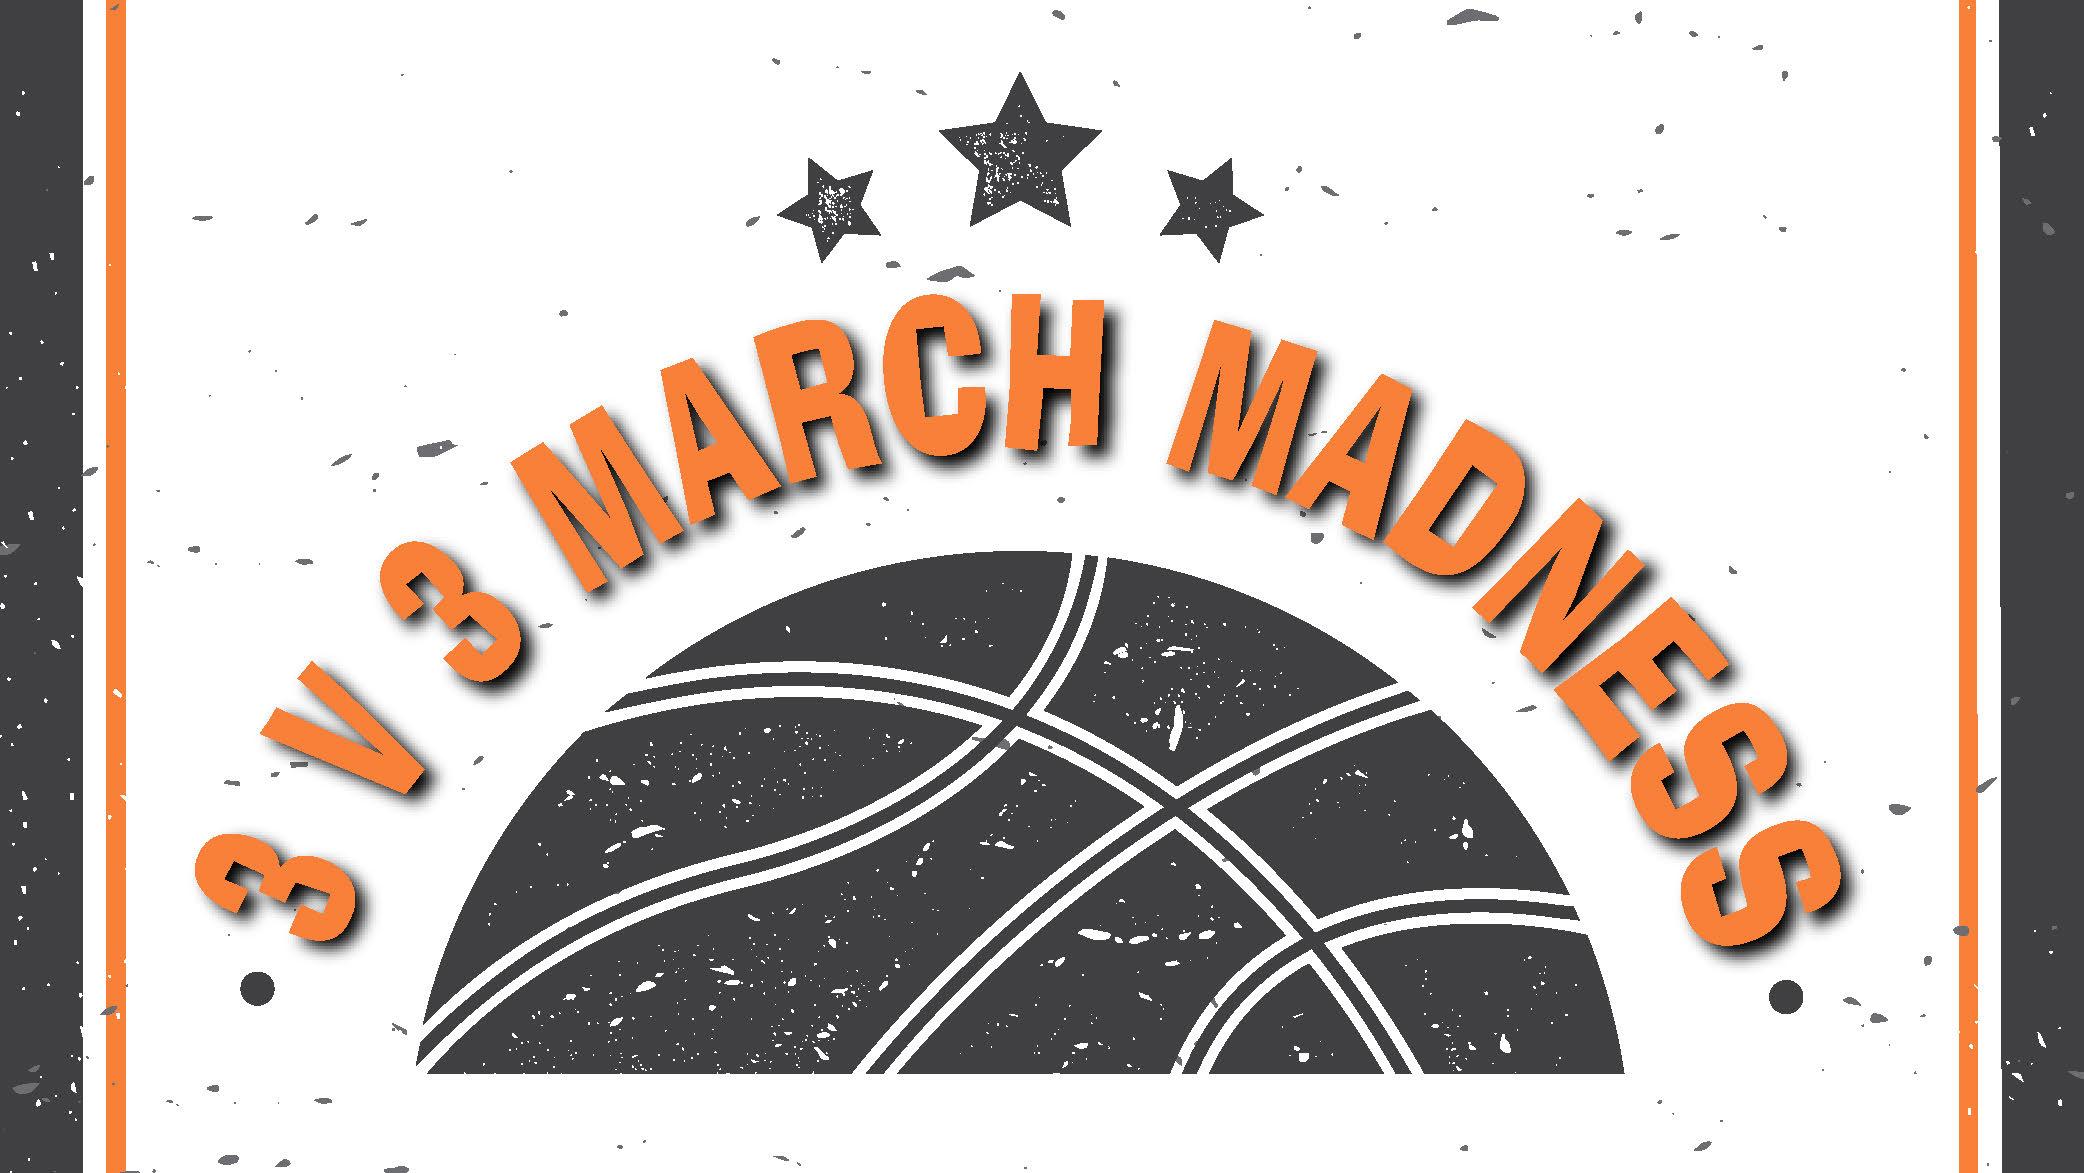 3v3 March Madness Tournament